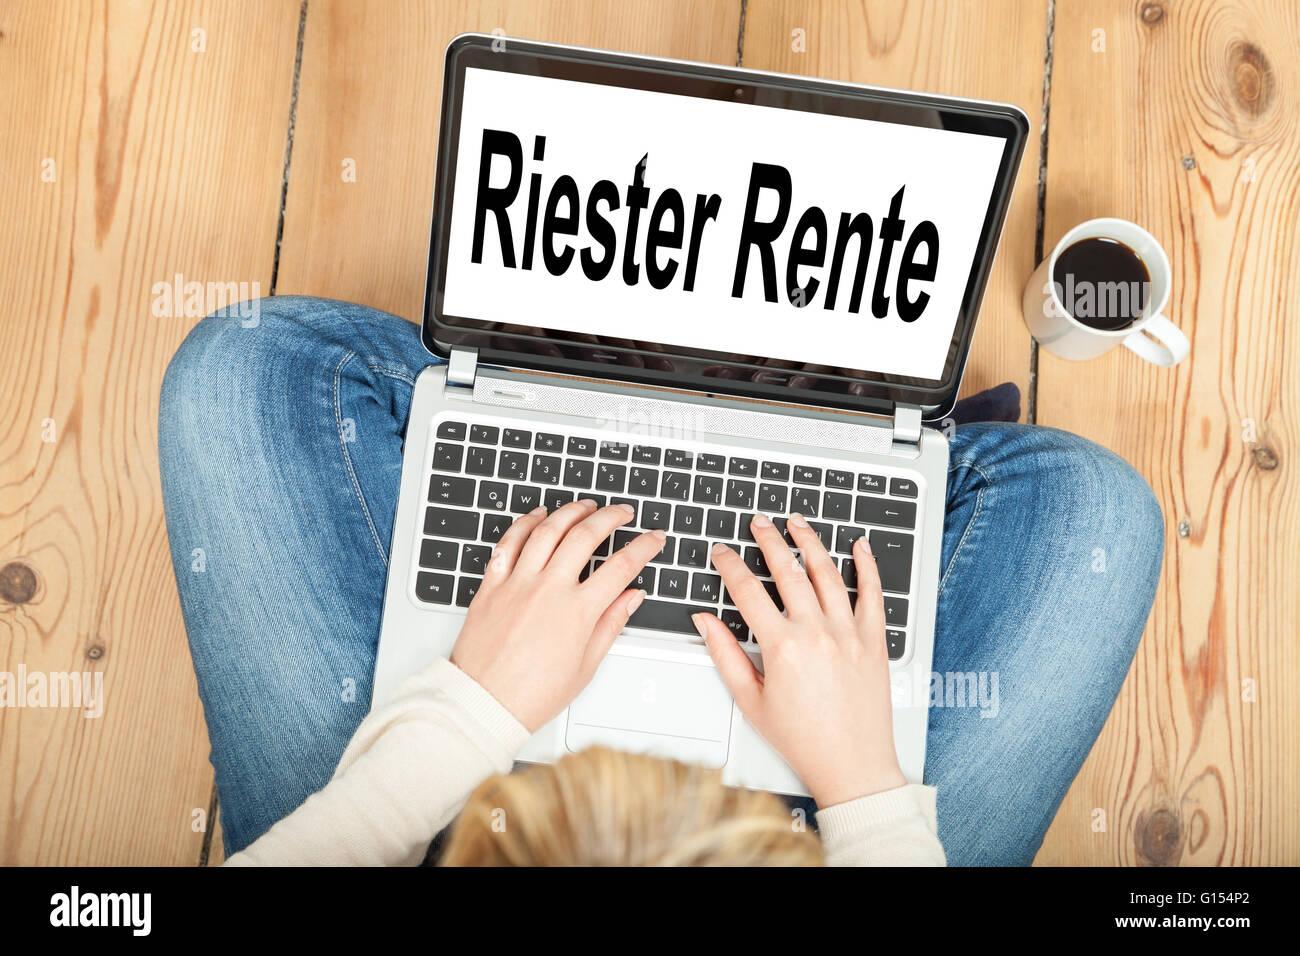 Riester Rente (german pension) Stock Photo